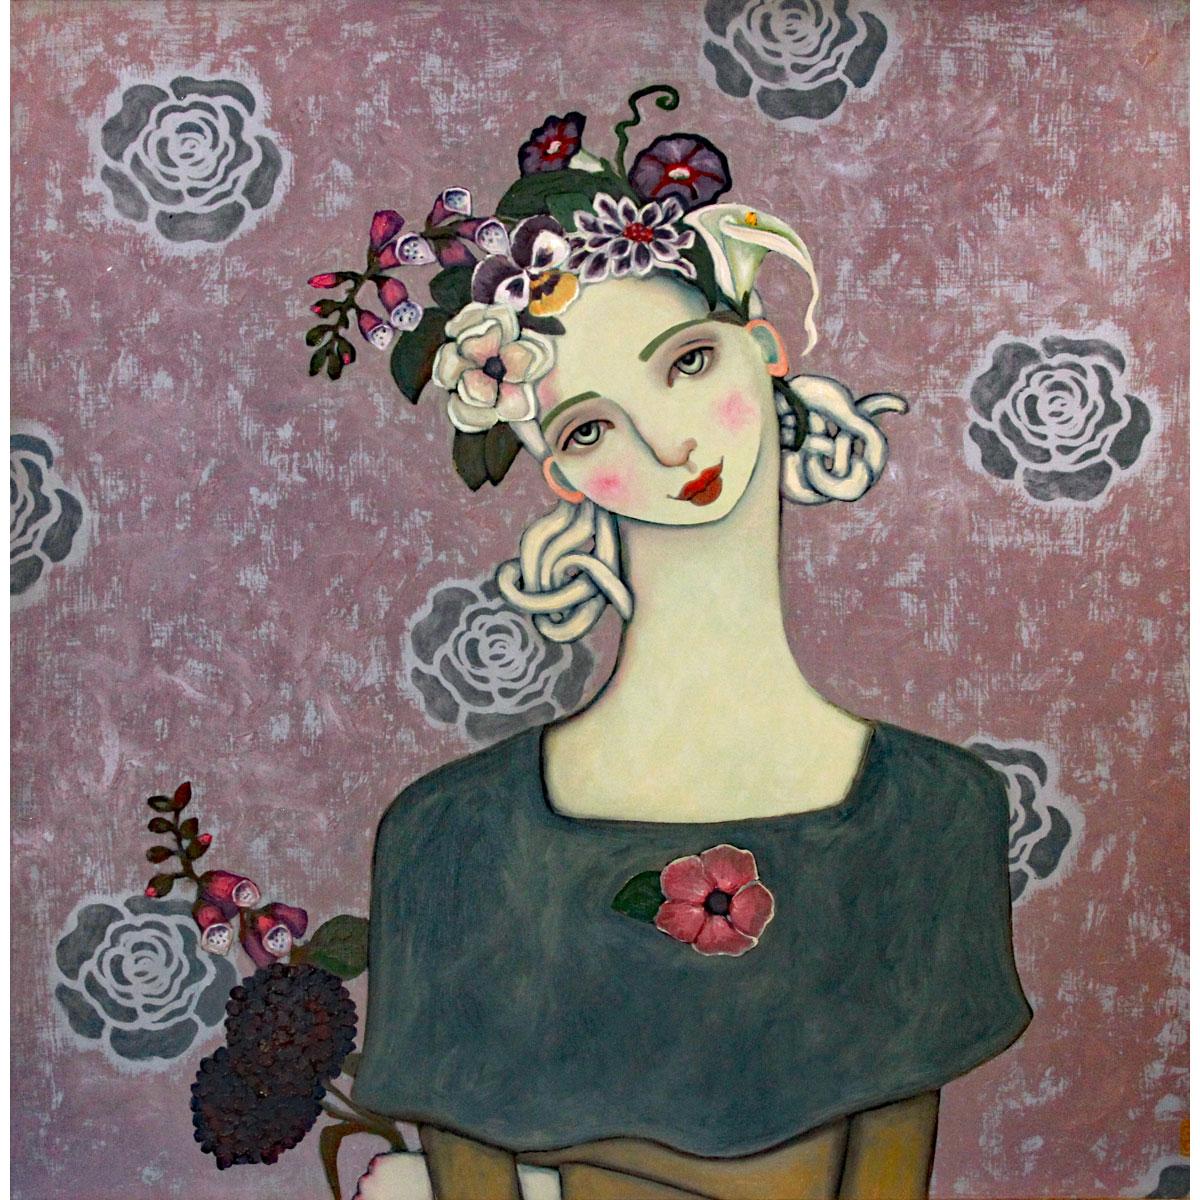 Pale Flower by Heather Barron